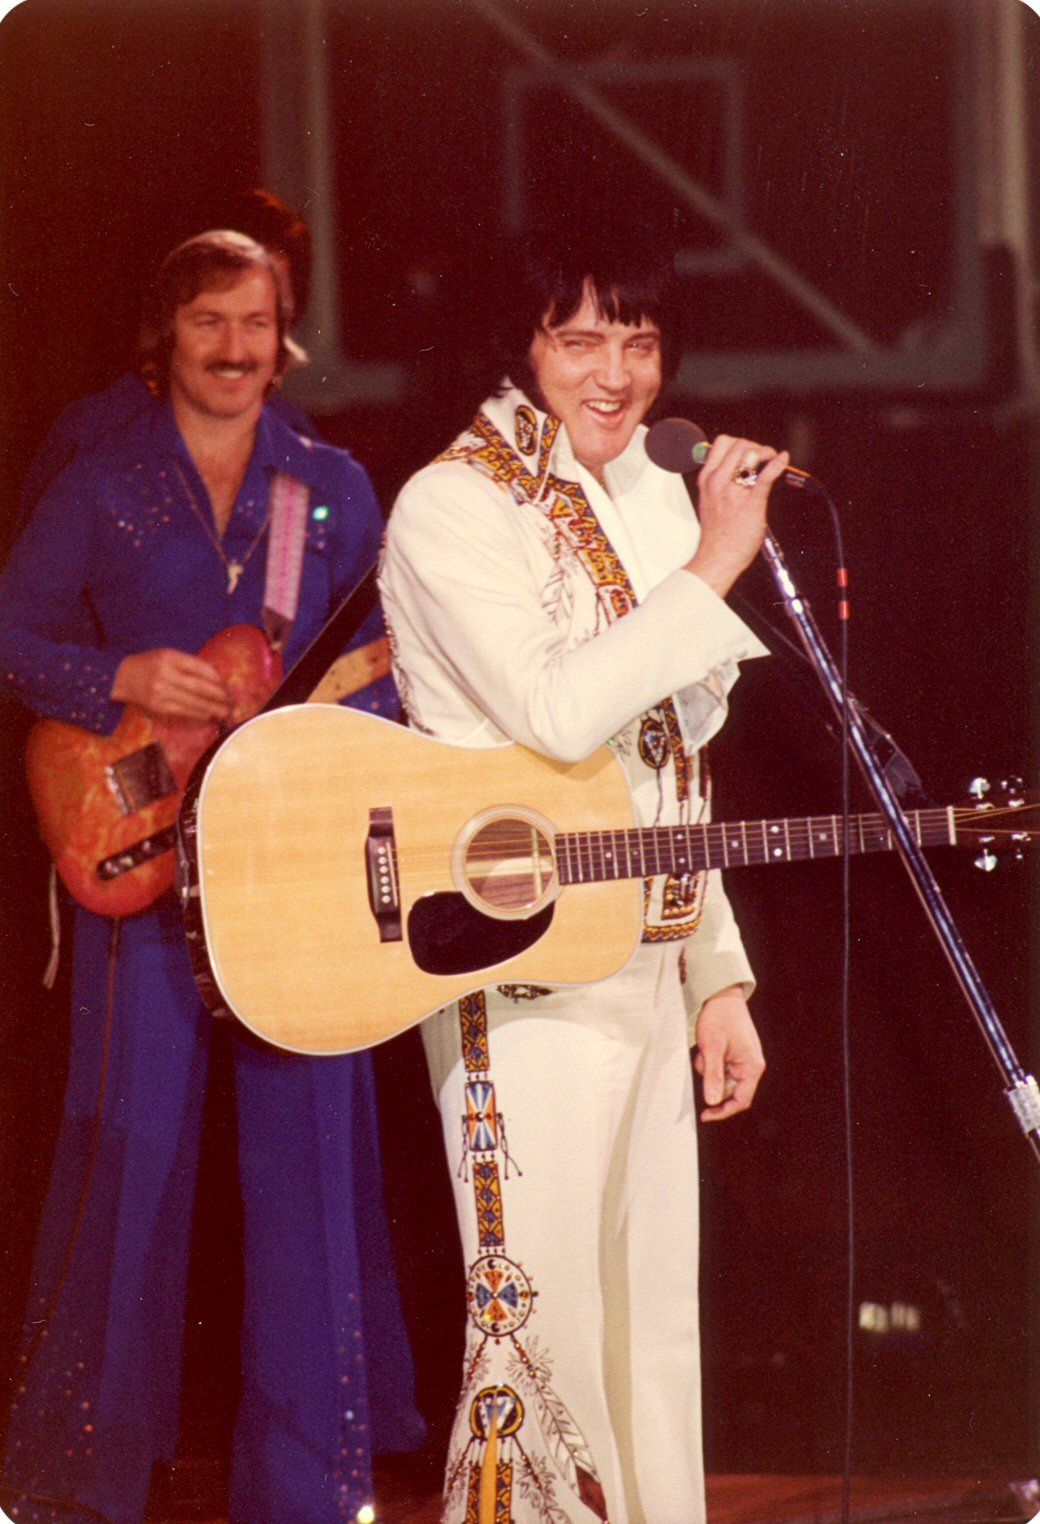 February 18, 1977. Columbia, SC.